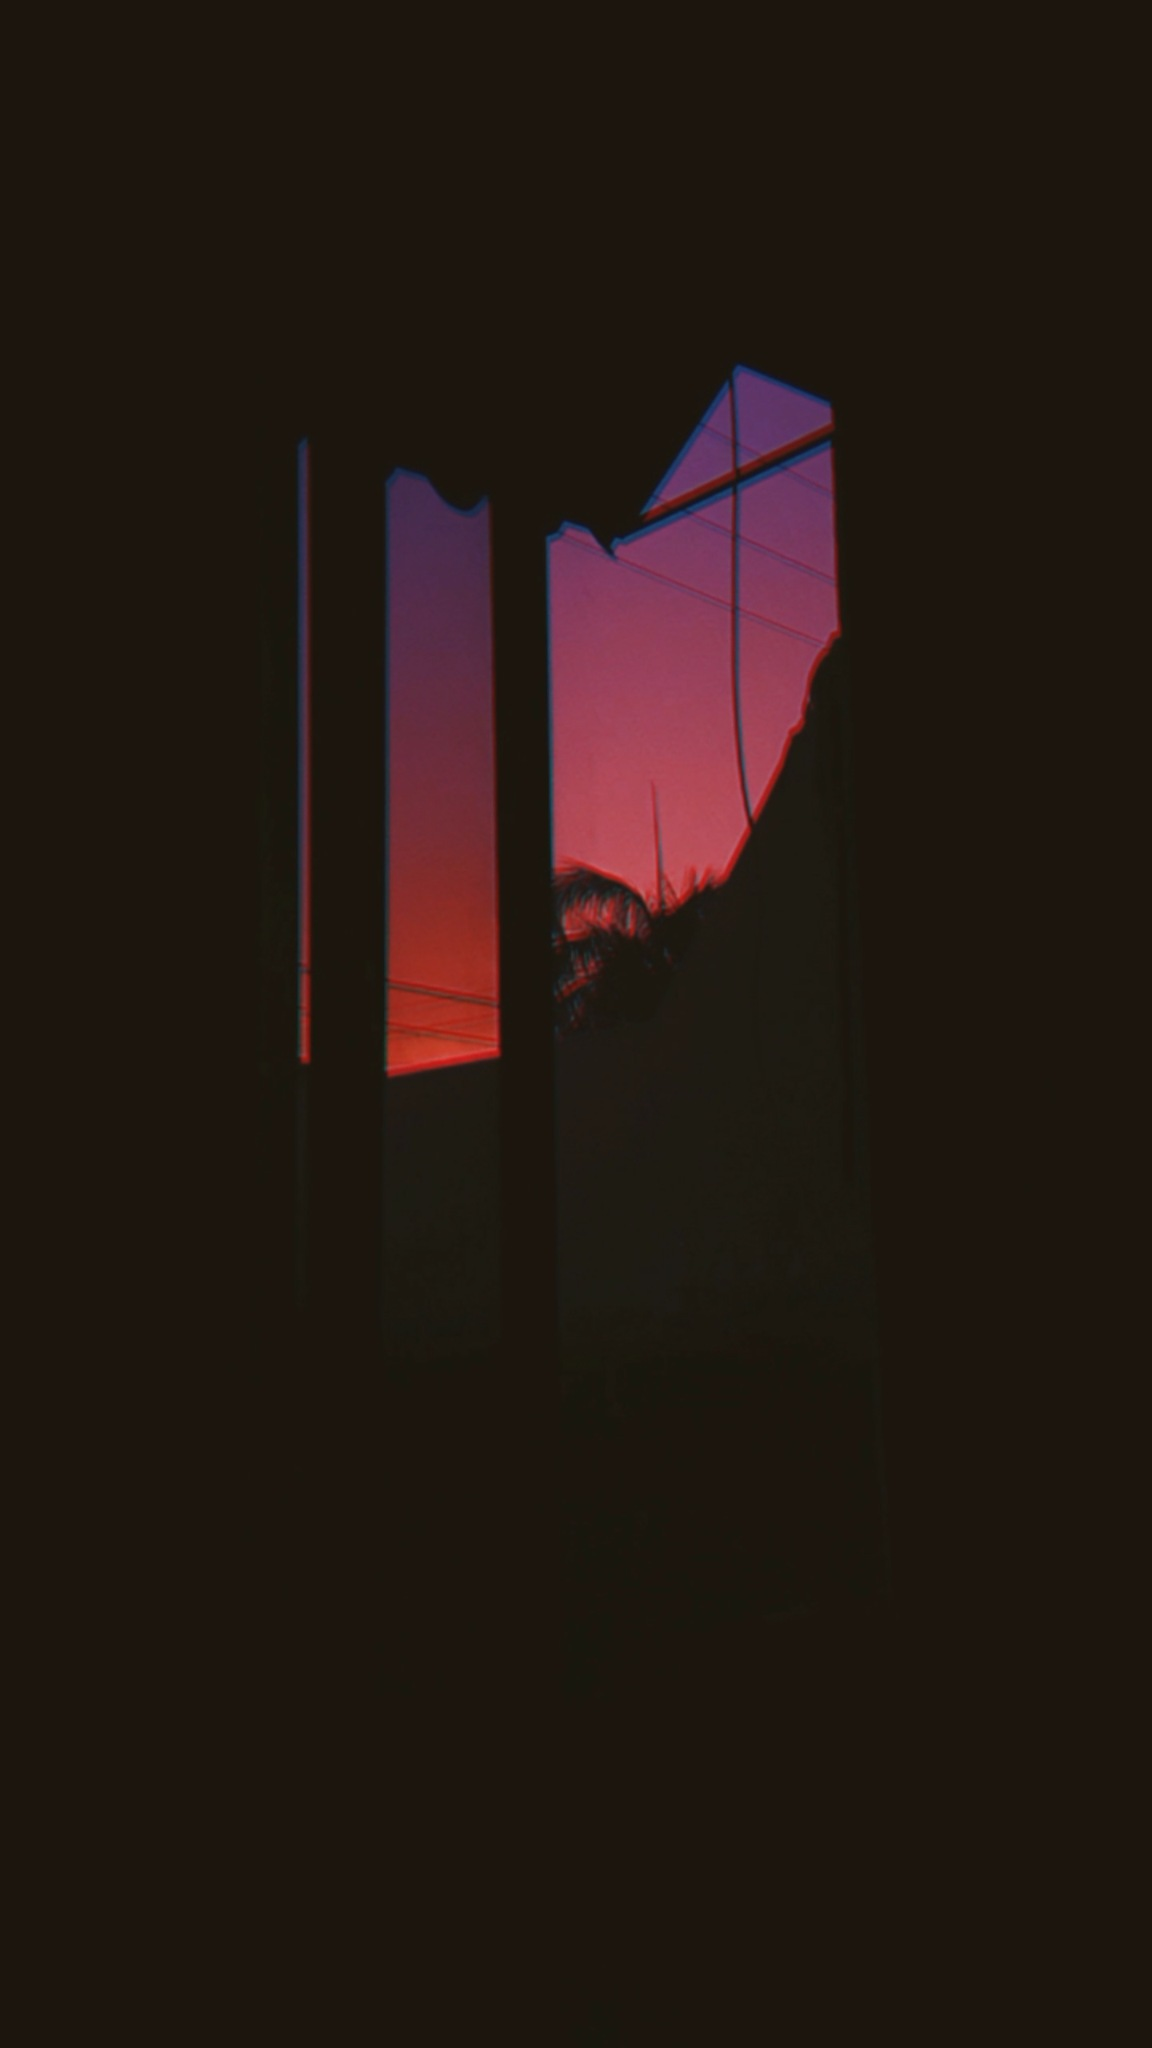 Neon vintage sunset by SavageTide Kid